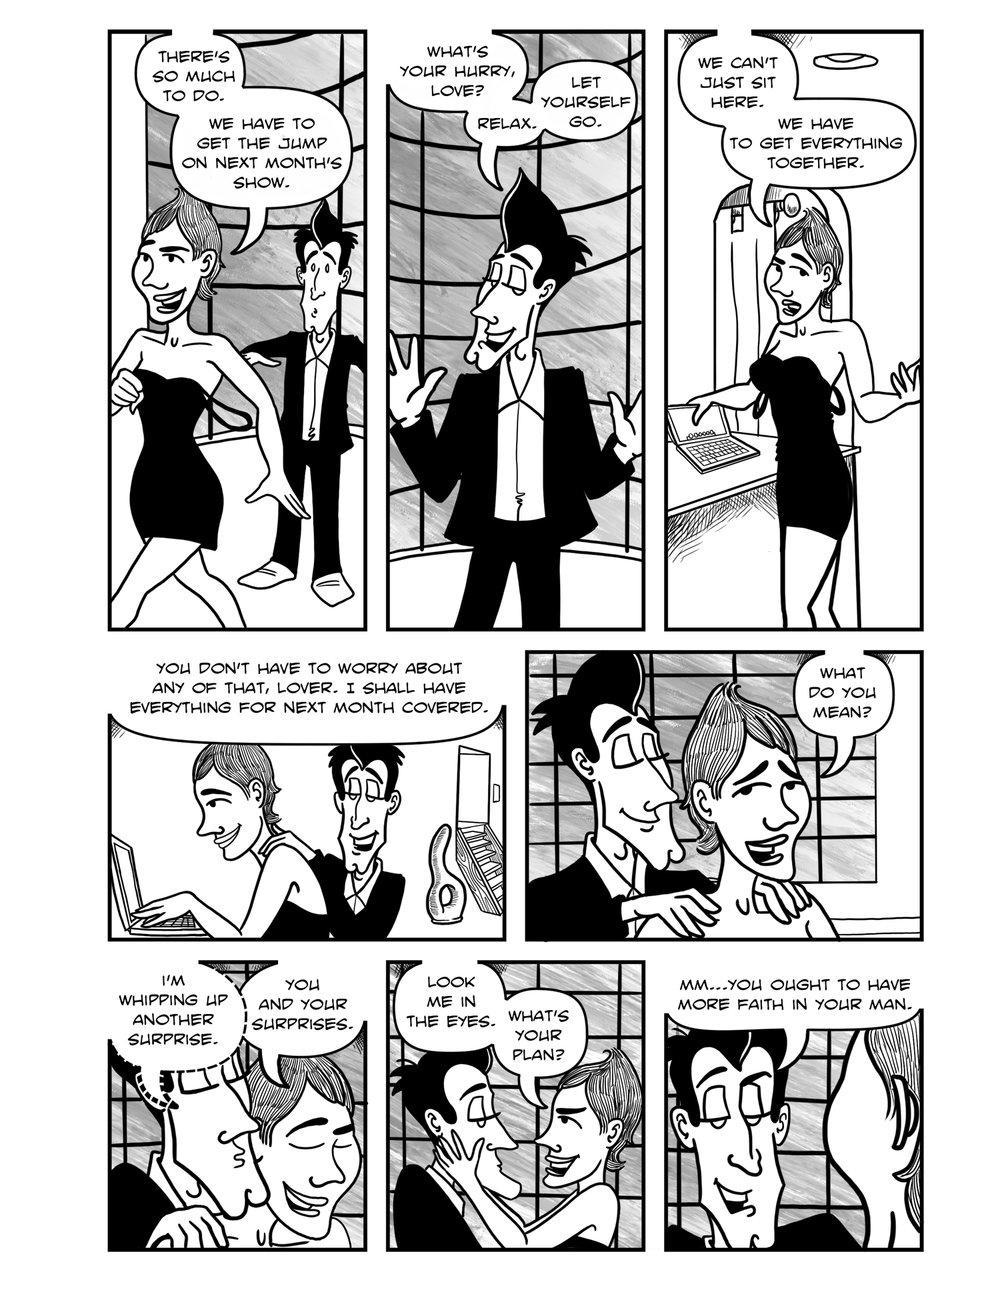 PAGE-294.jpg